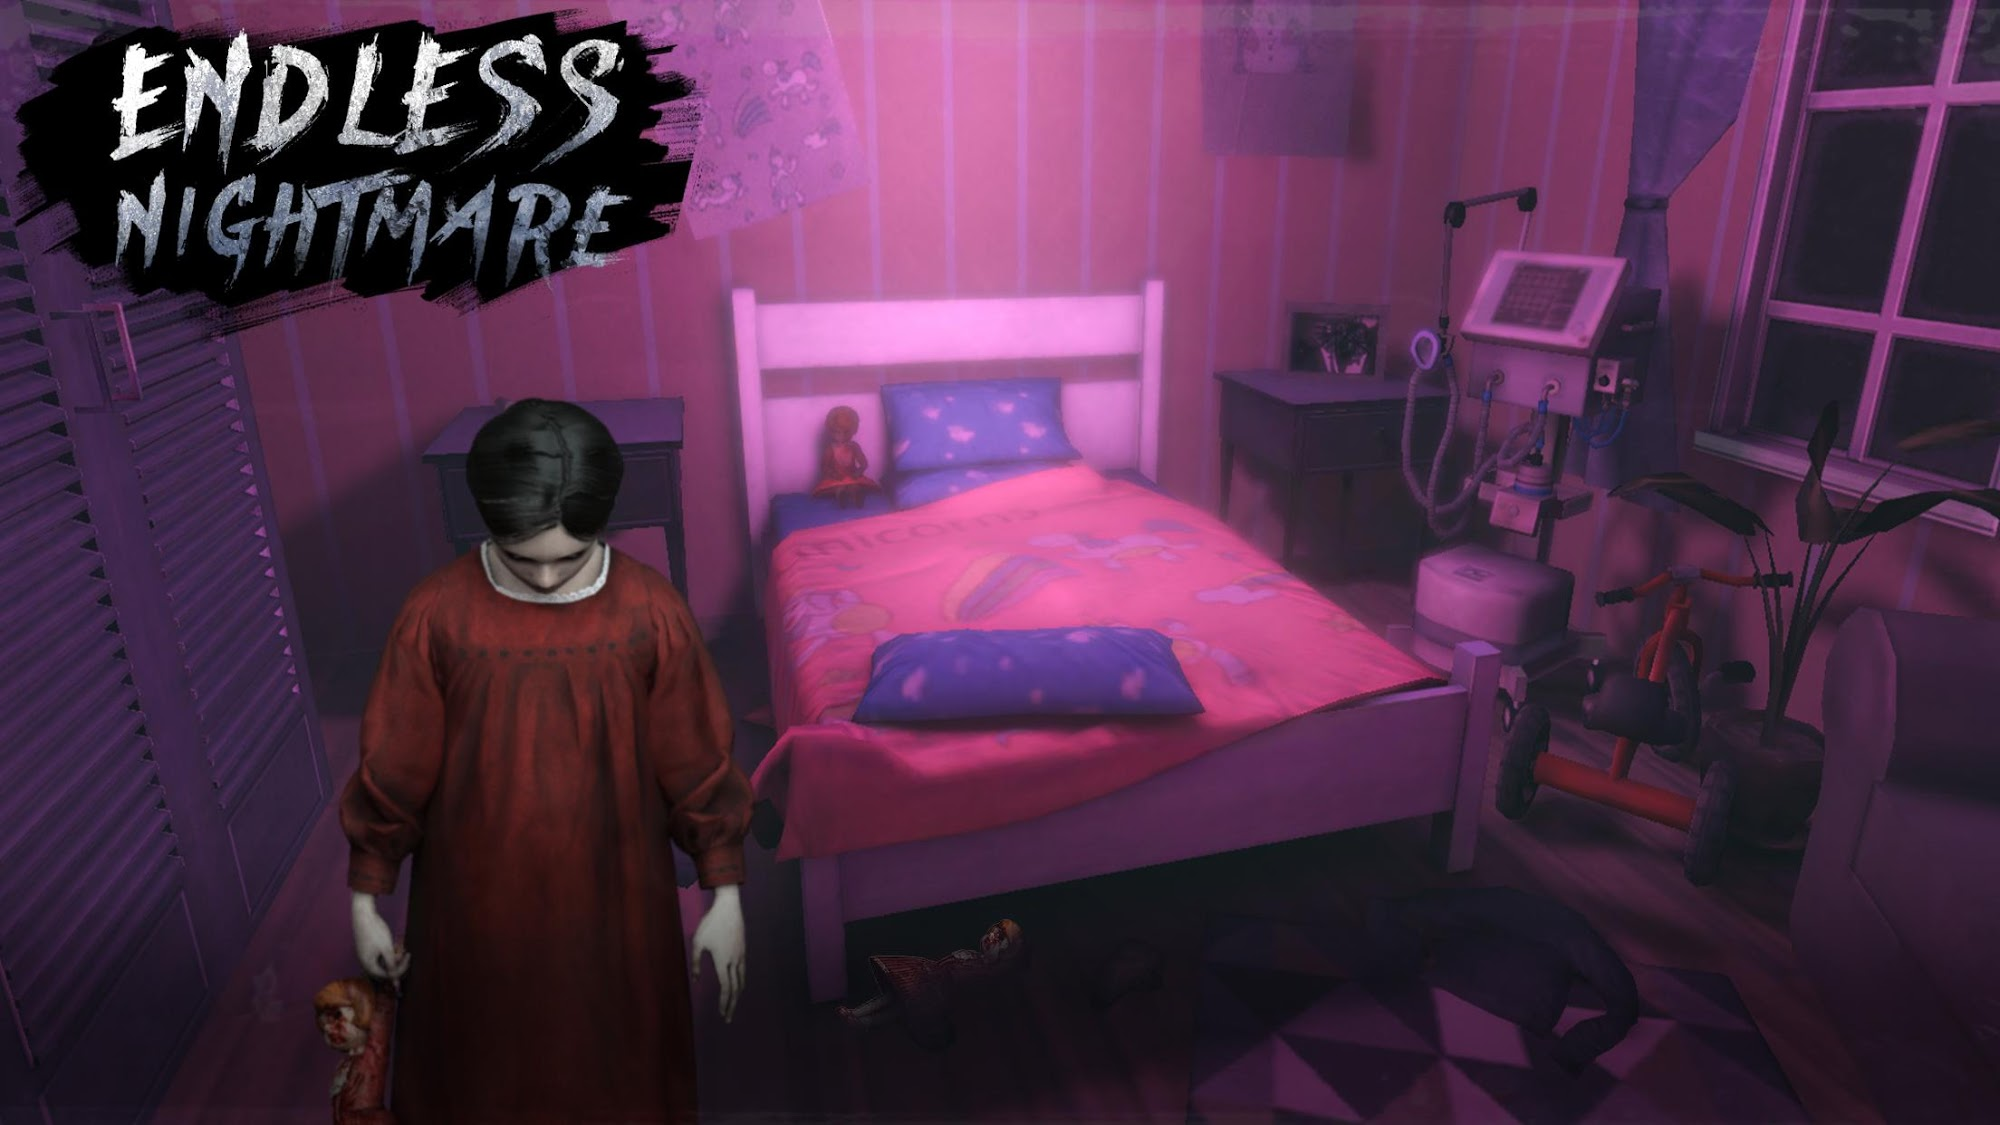 Endless Nightmare: 3D Creepy & Scary Horror Game captura de tela 1